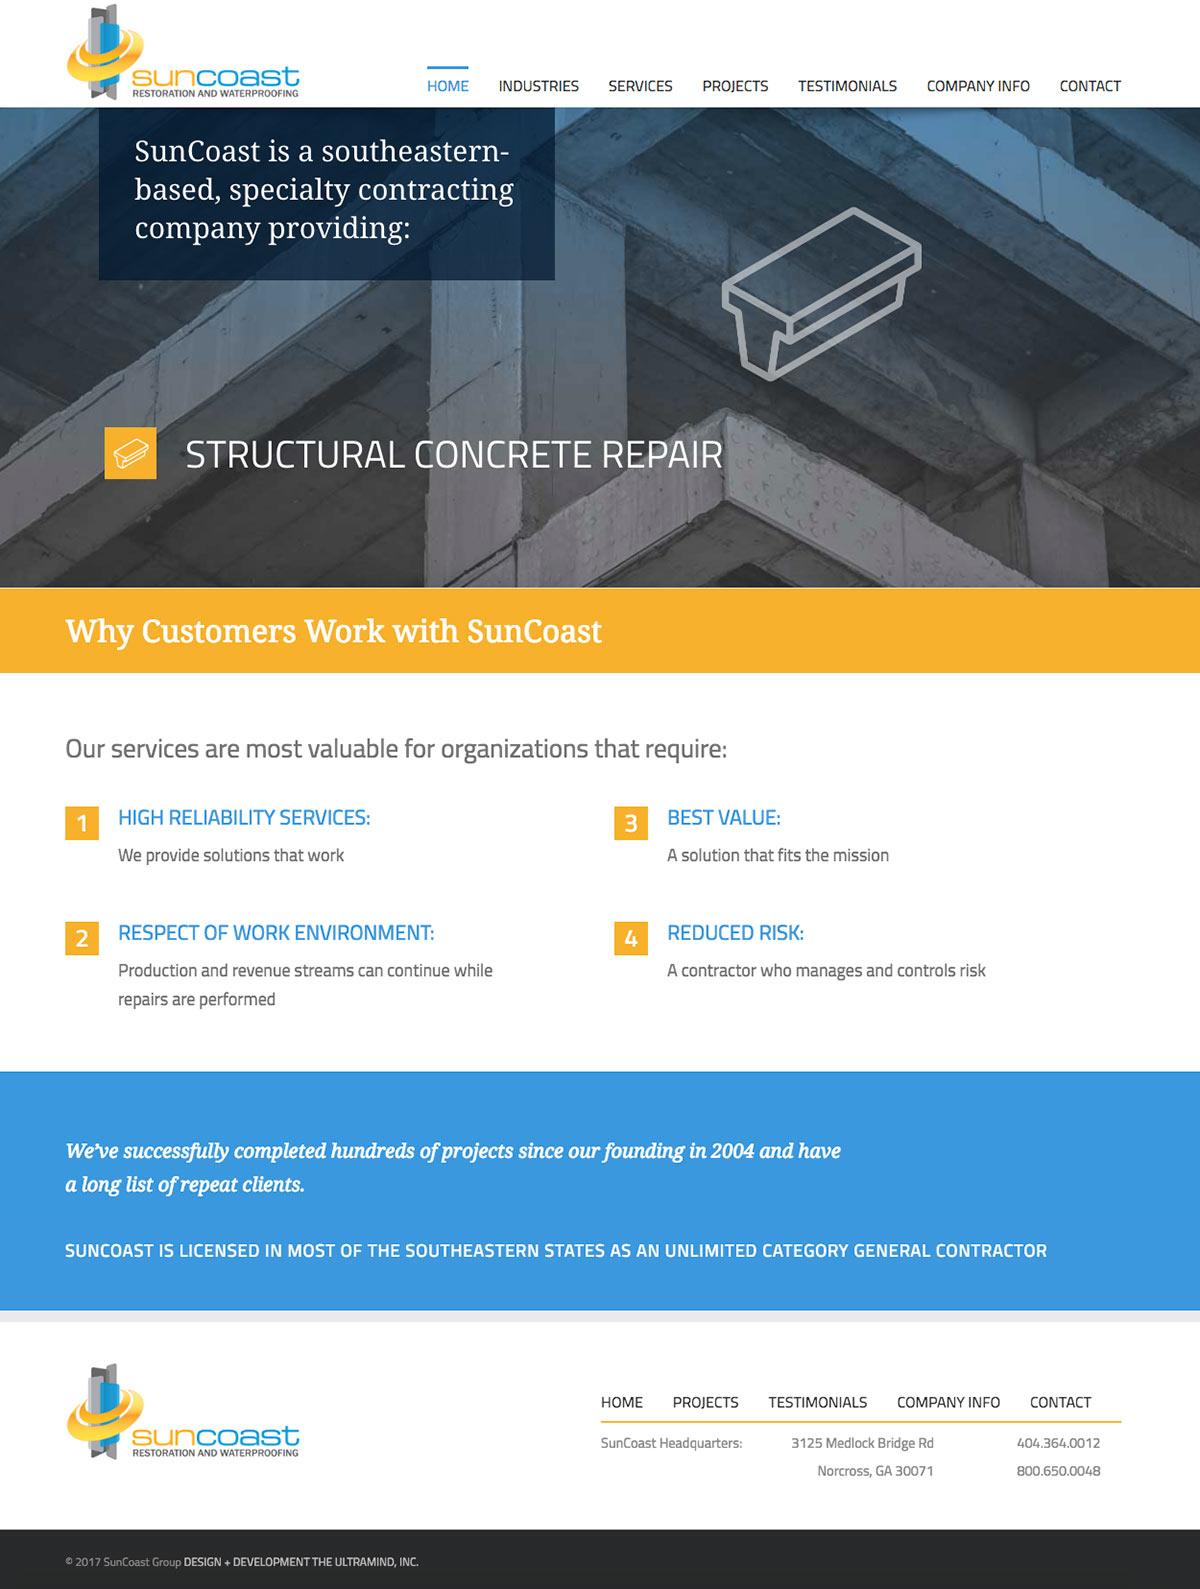 SunCoast-Group.com web site design and development home page